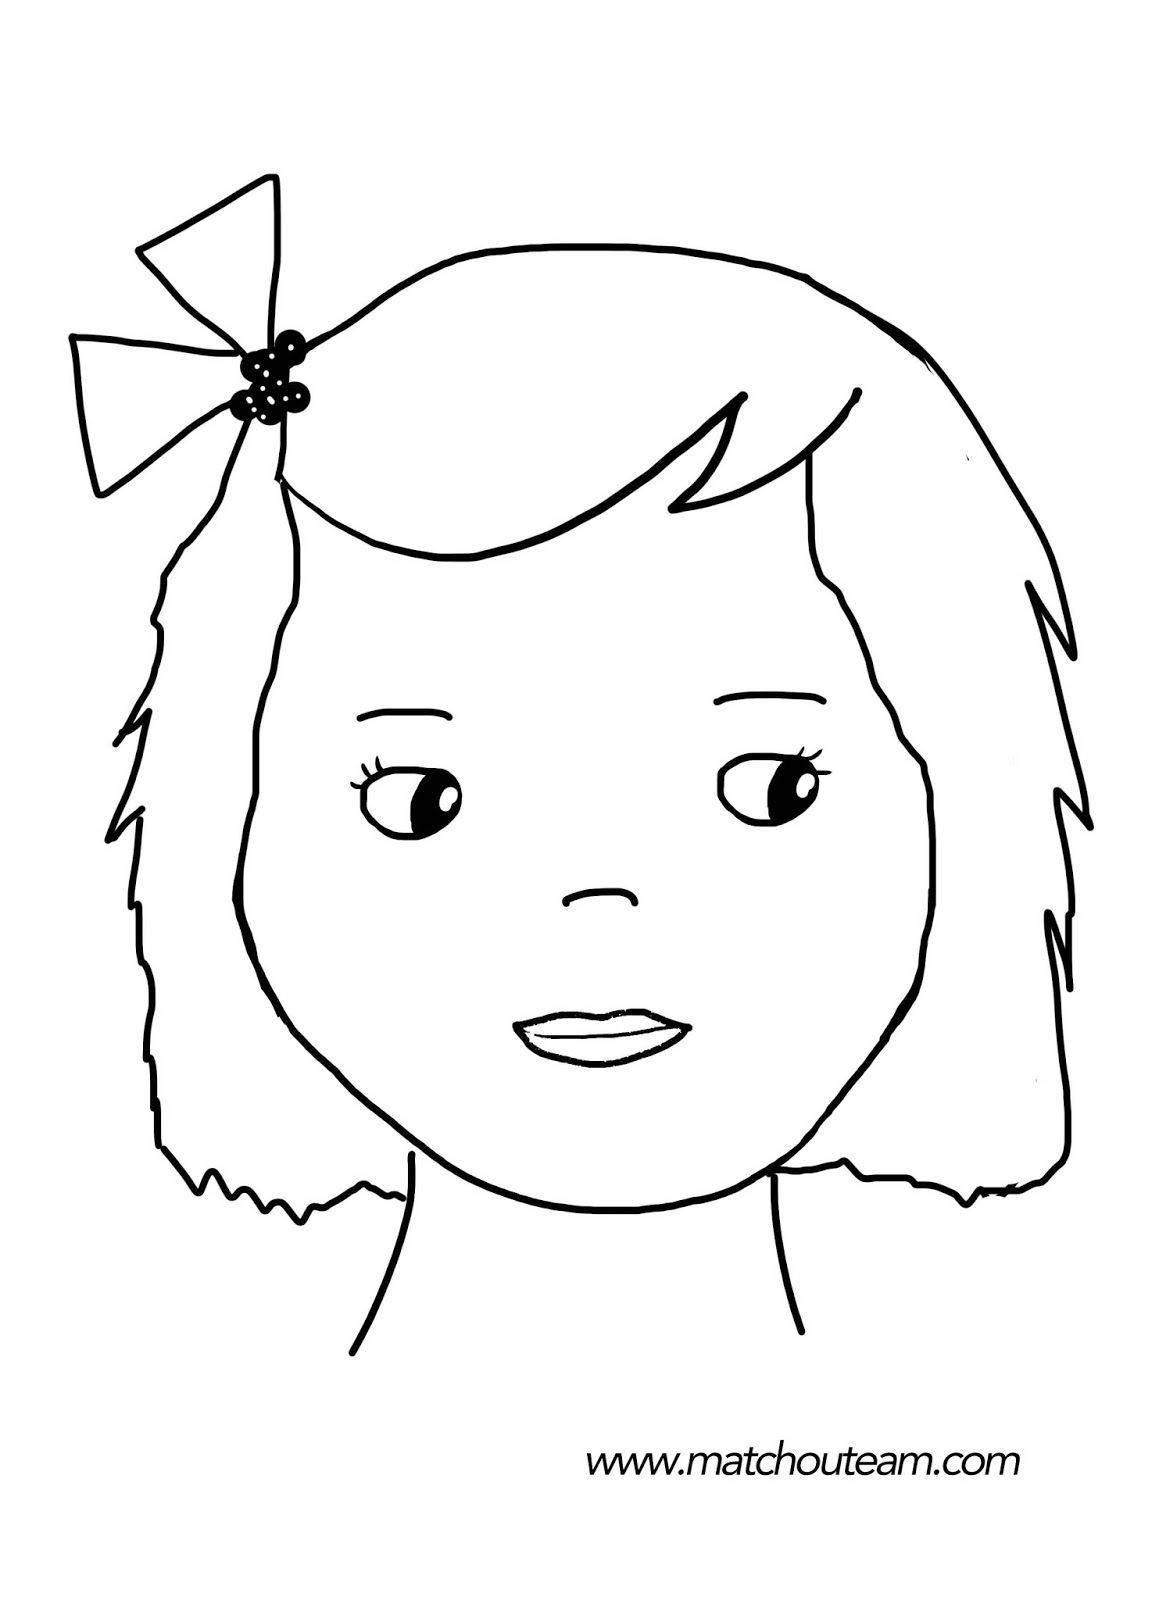 Maquillage enfants inspirations inspiration - Coloriage fillette ...